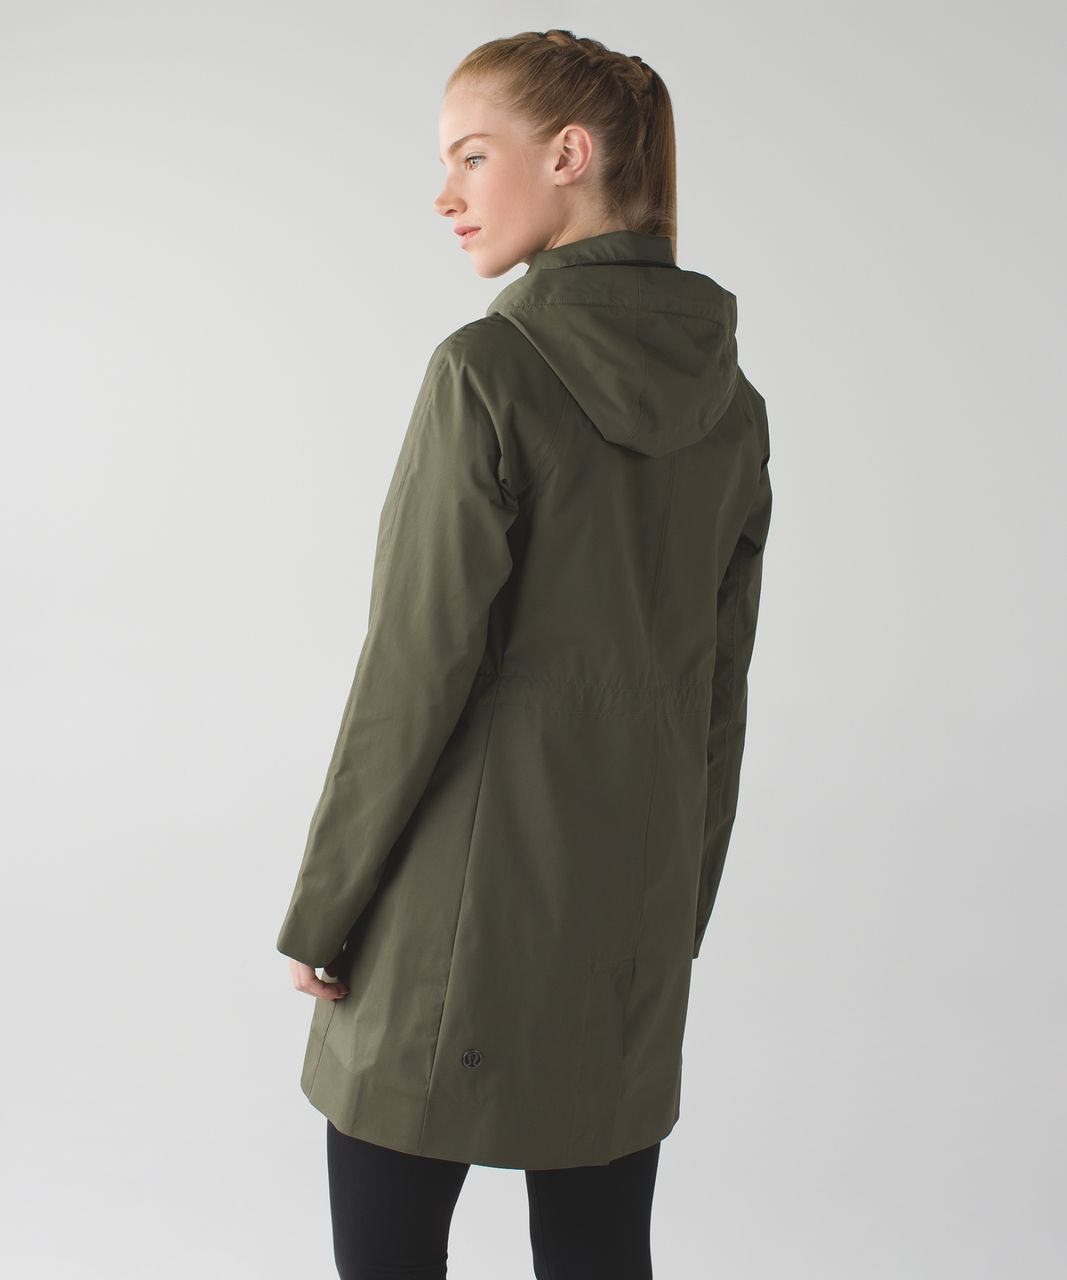 Lululemon Rain On Jacket - Fatigue Green - lulu fanatics